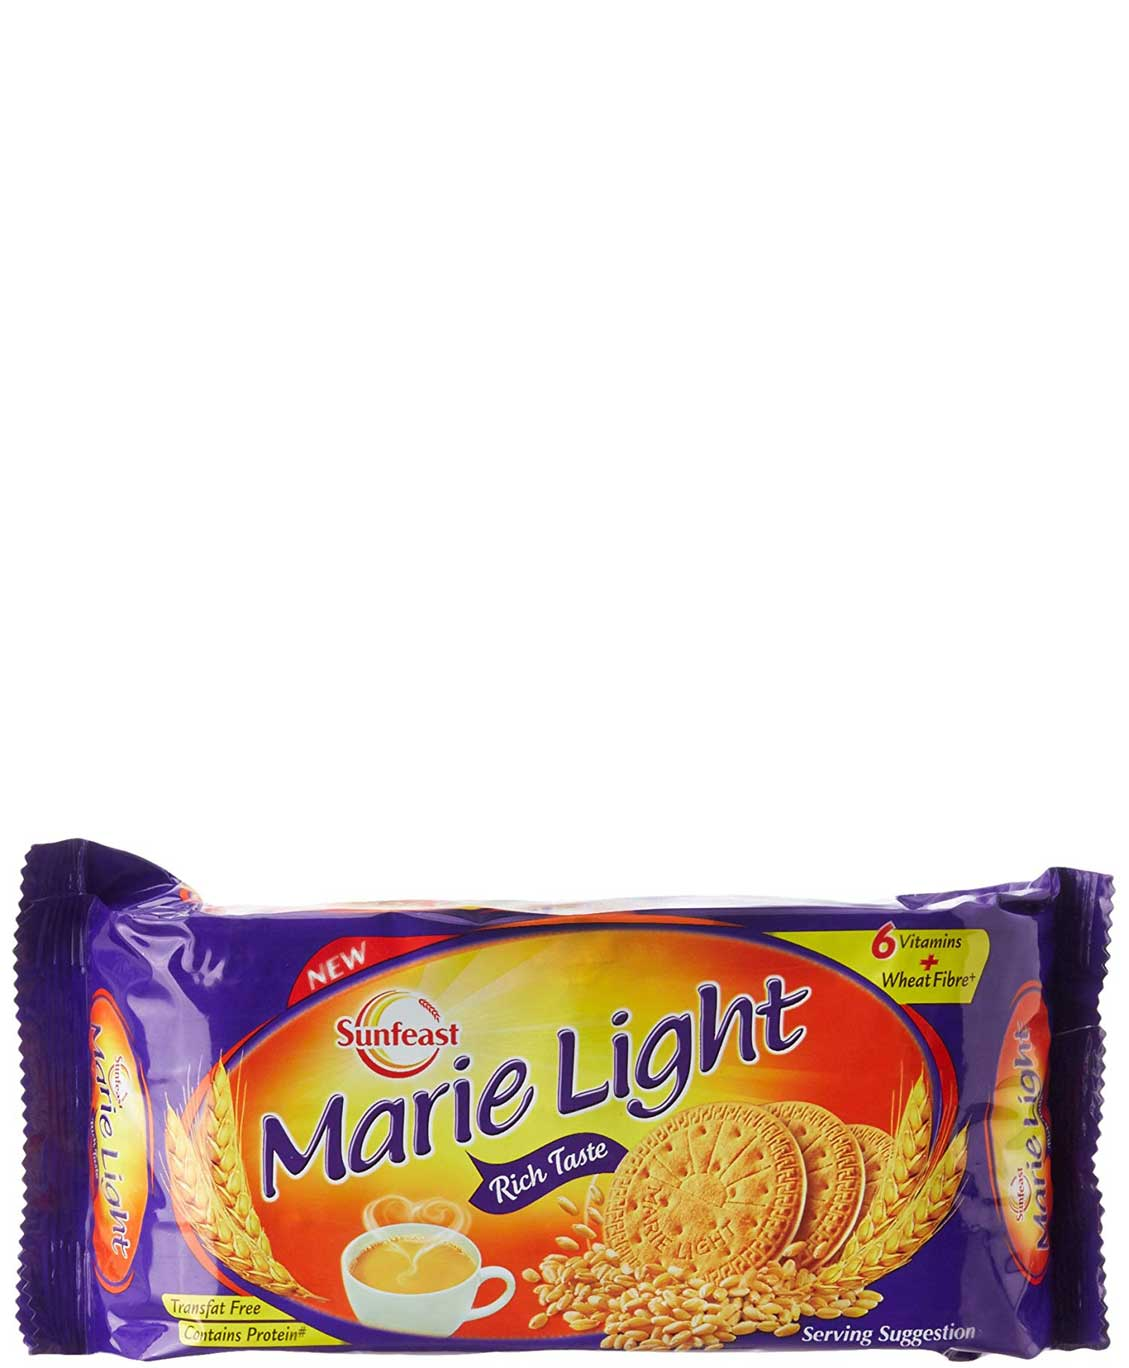 Sunfeast Marie Light 200g